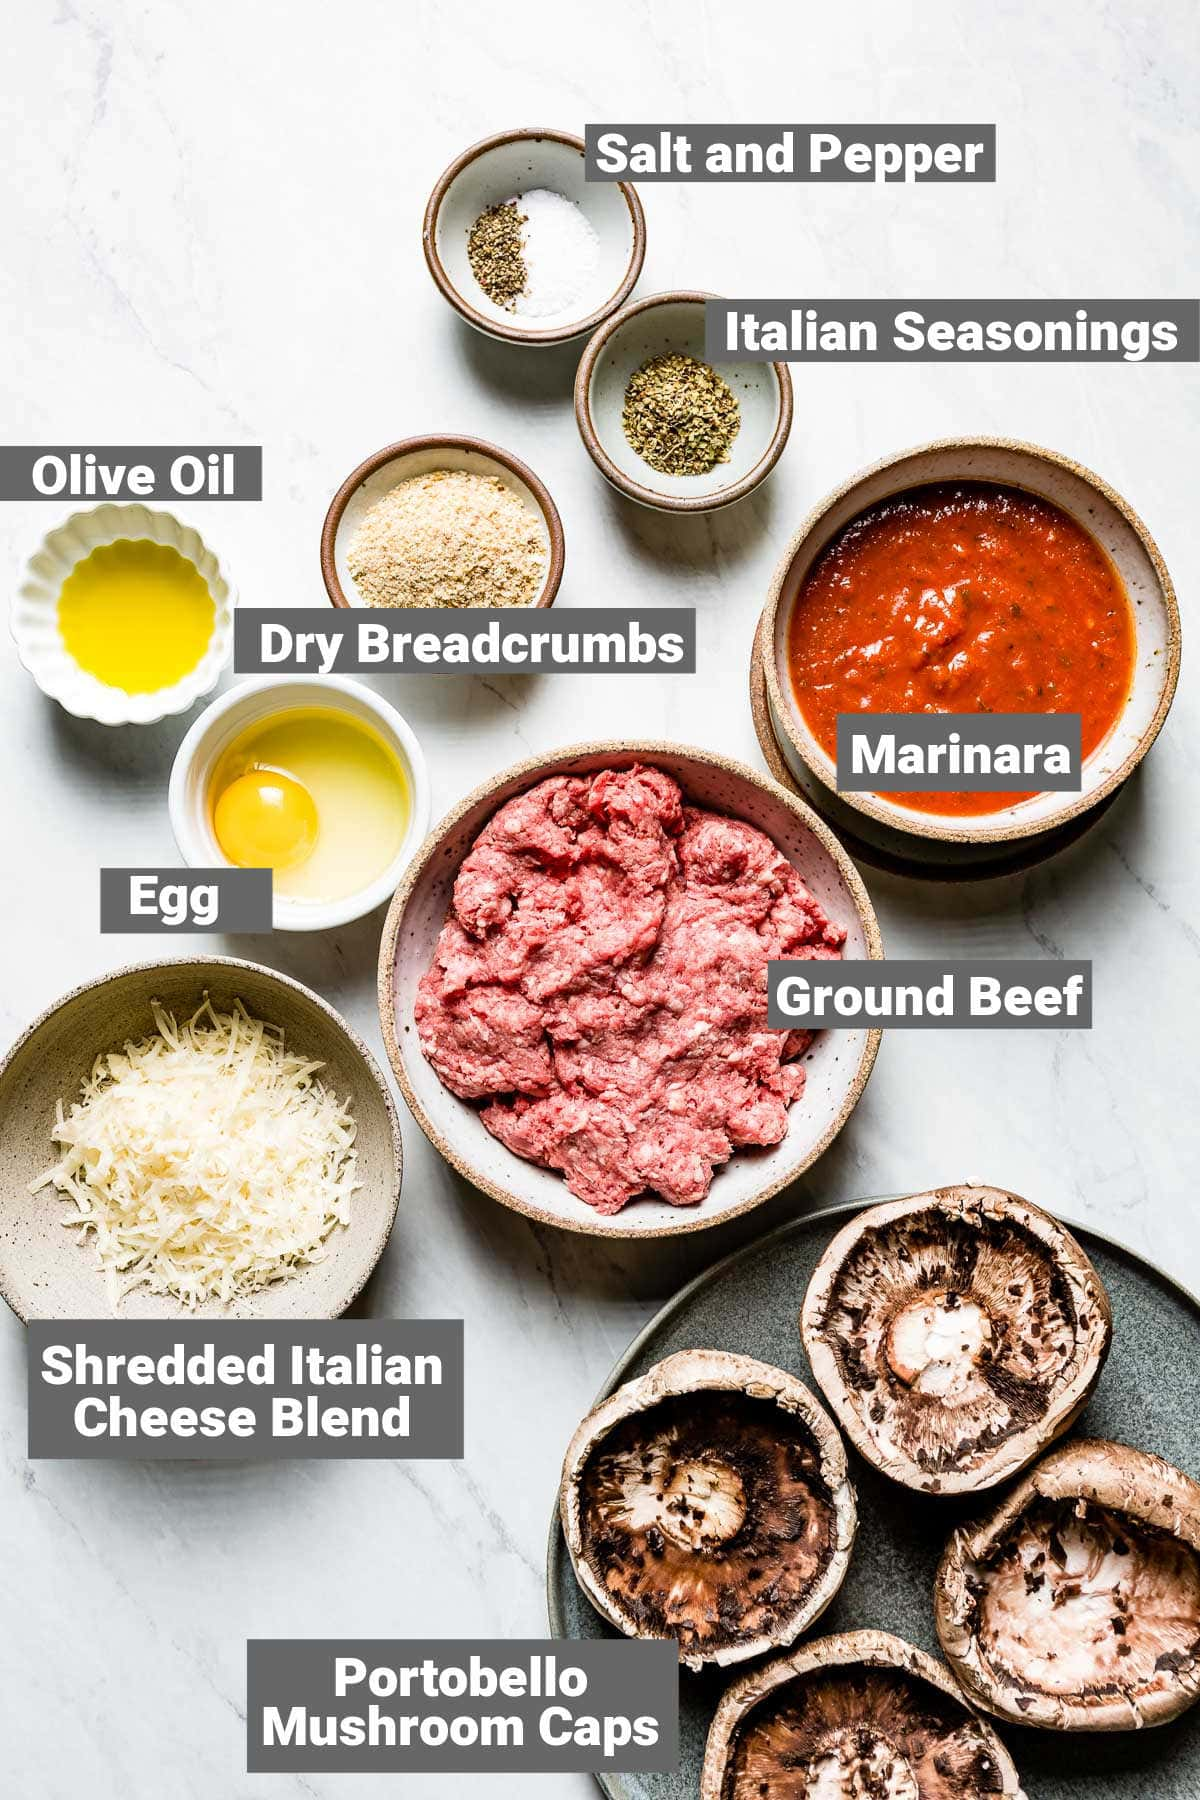 ingredients for stuffed portobellos